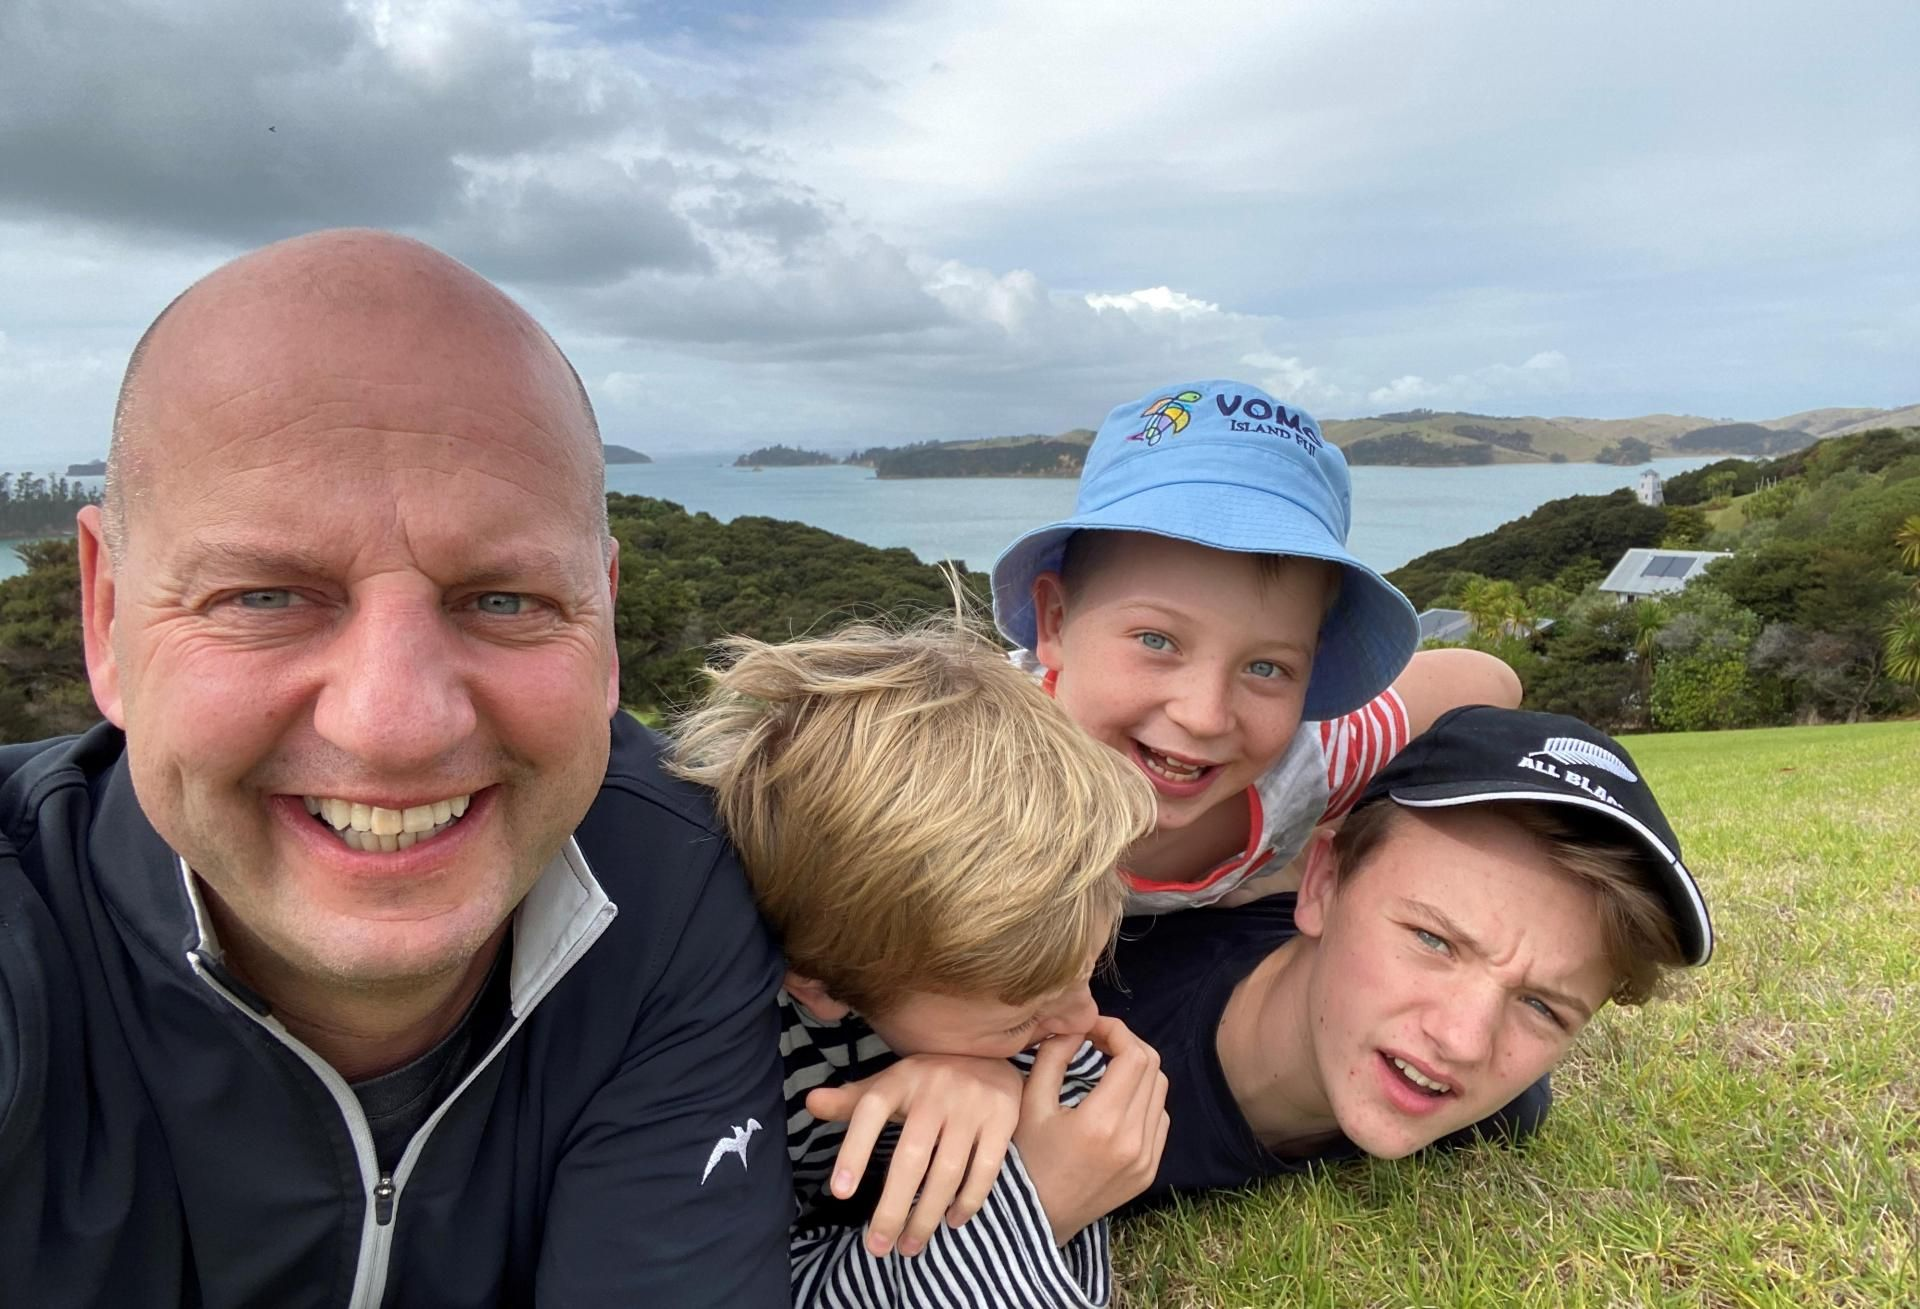 My New Normal: Evans Randall's Kent Gardner On Lockdown Life In New Zealand